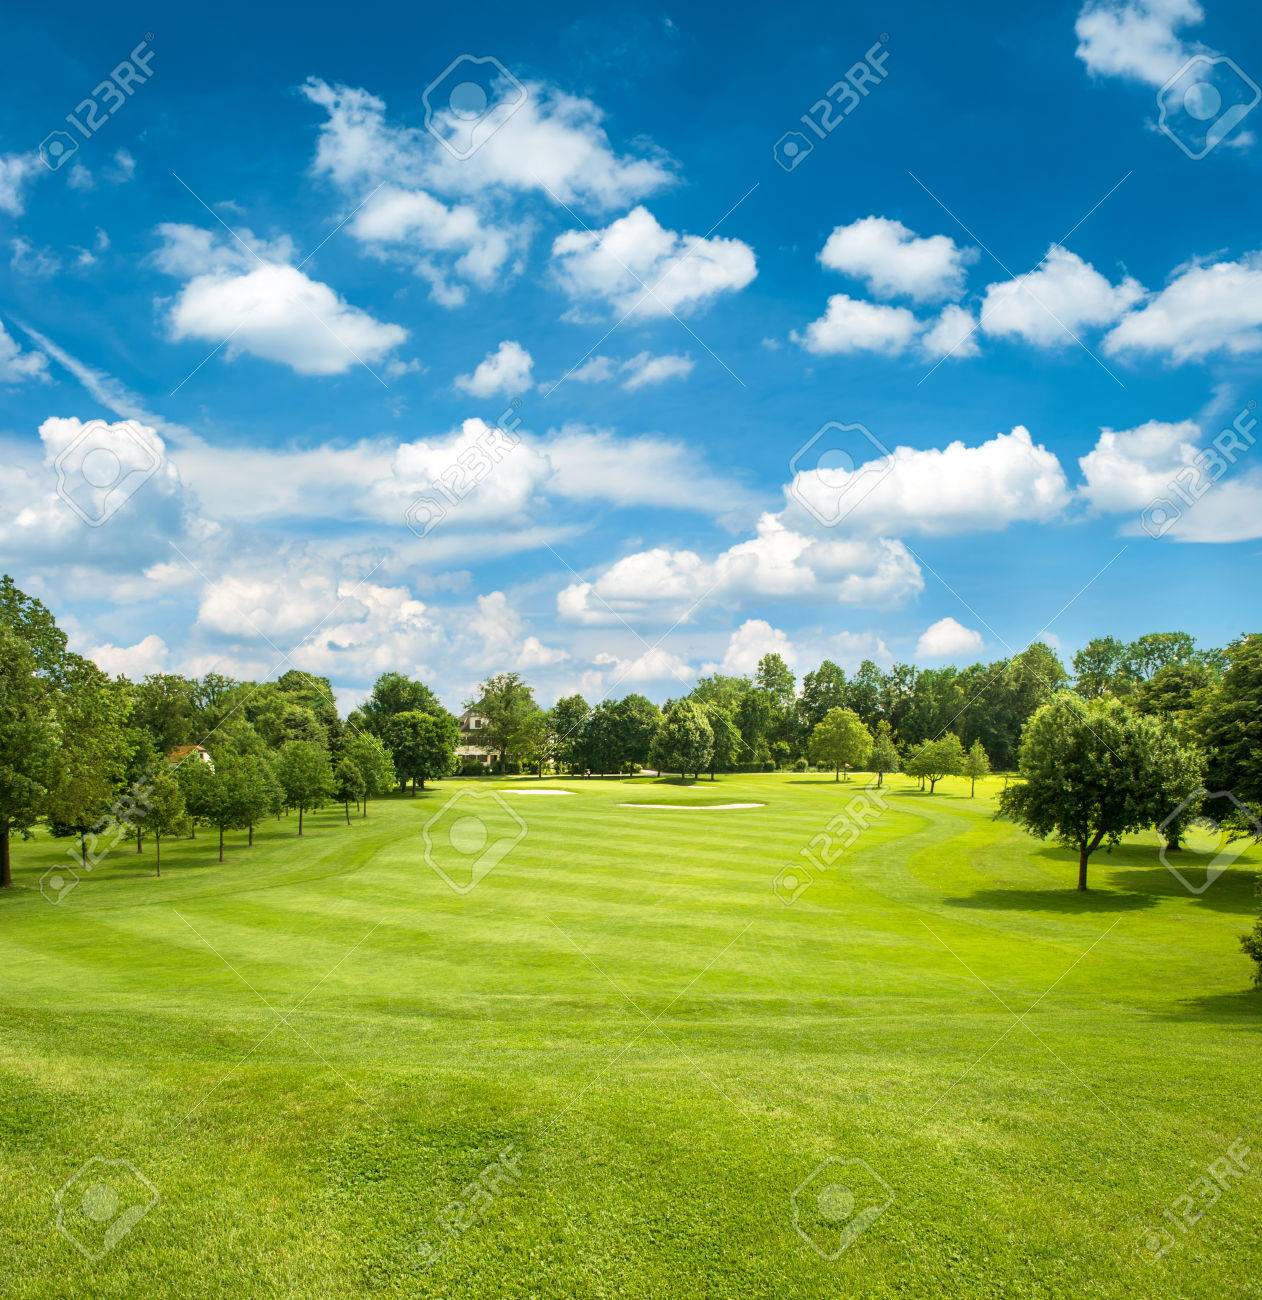 green golf field and blue cloudy sky european landscape - 29758836